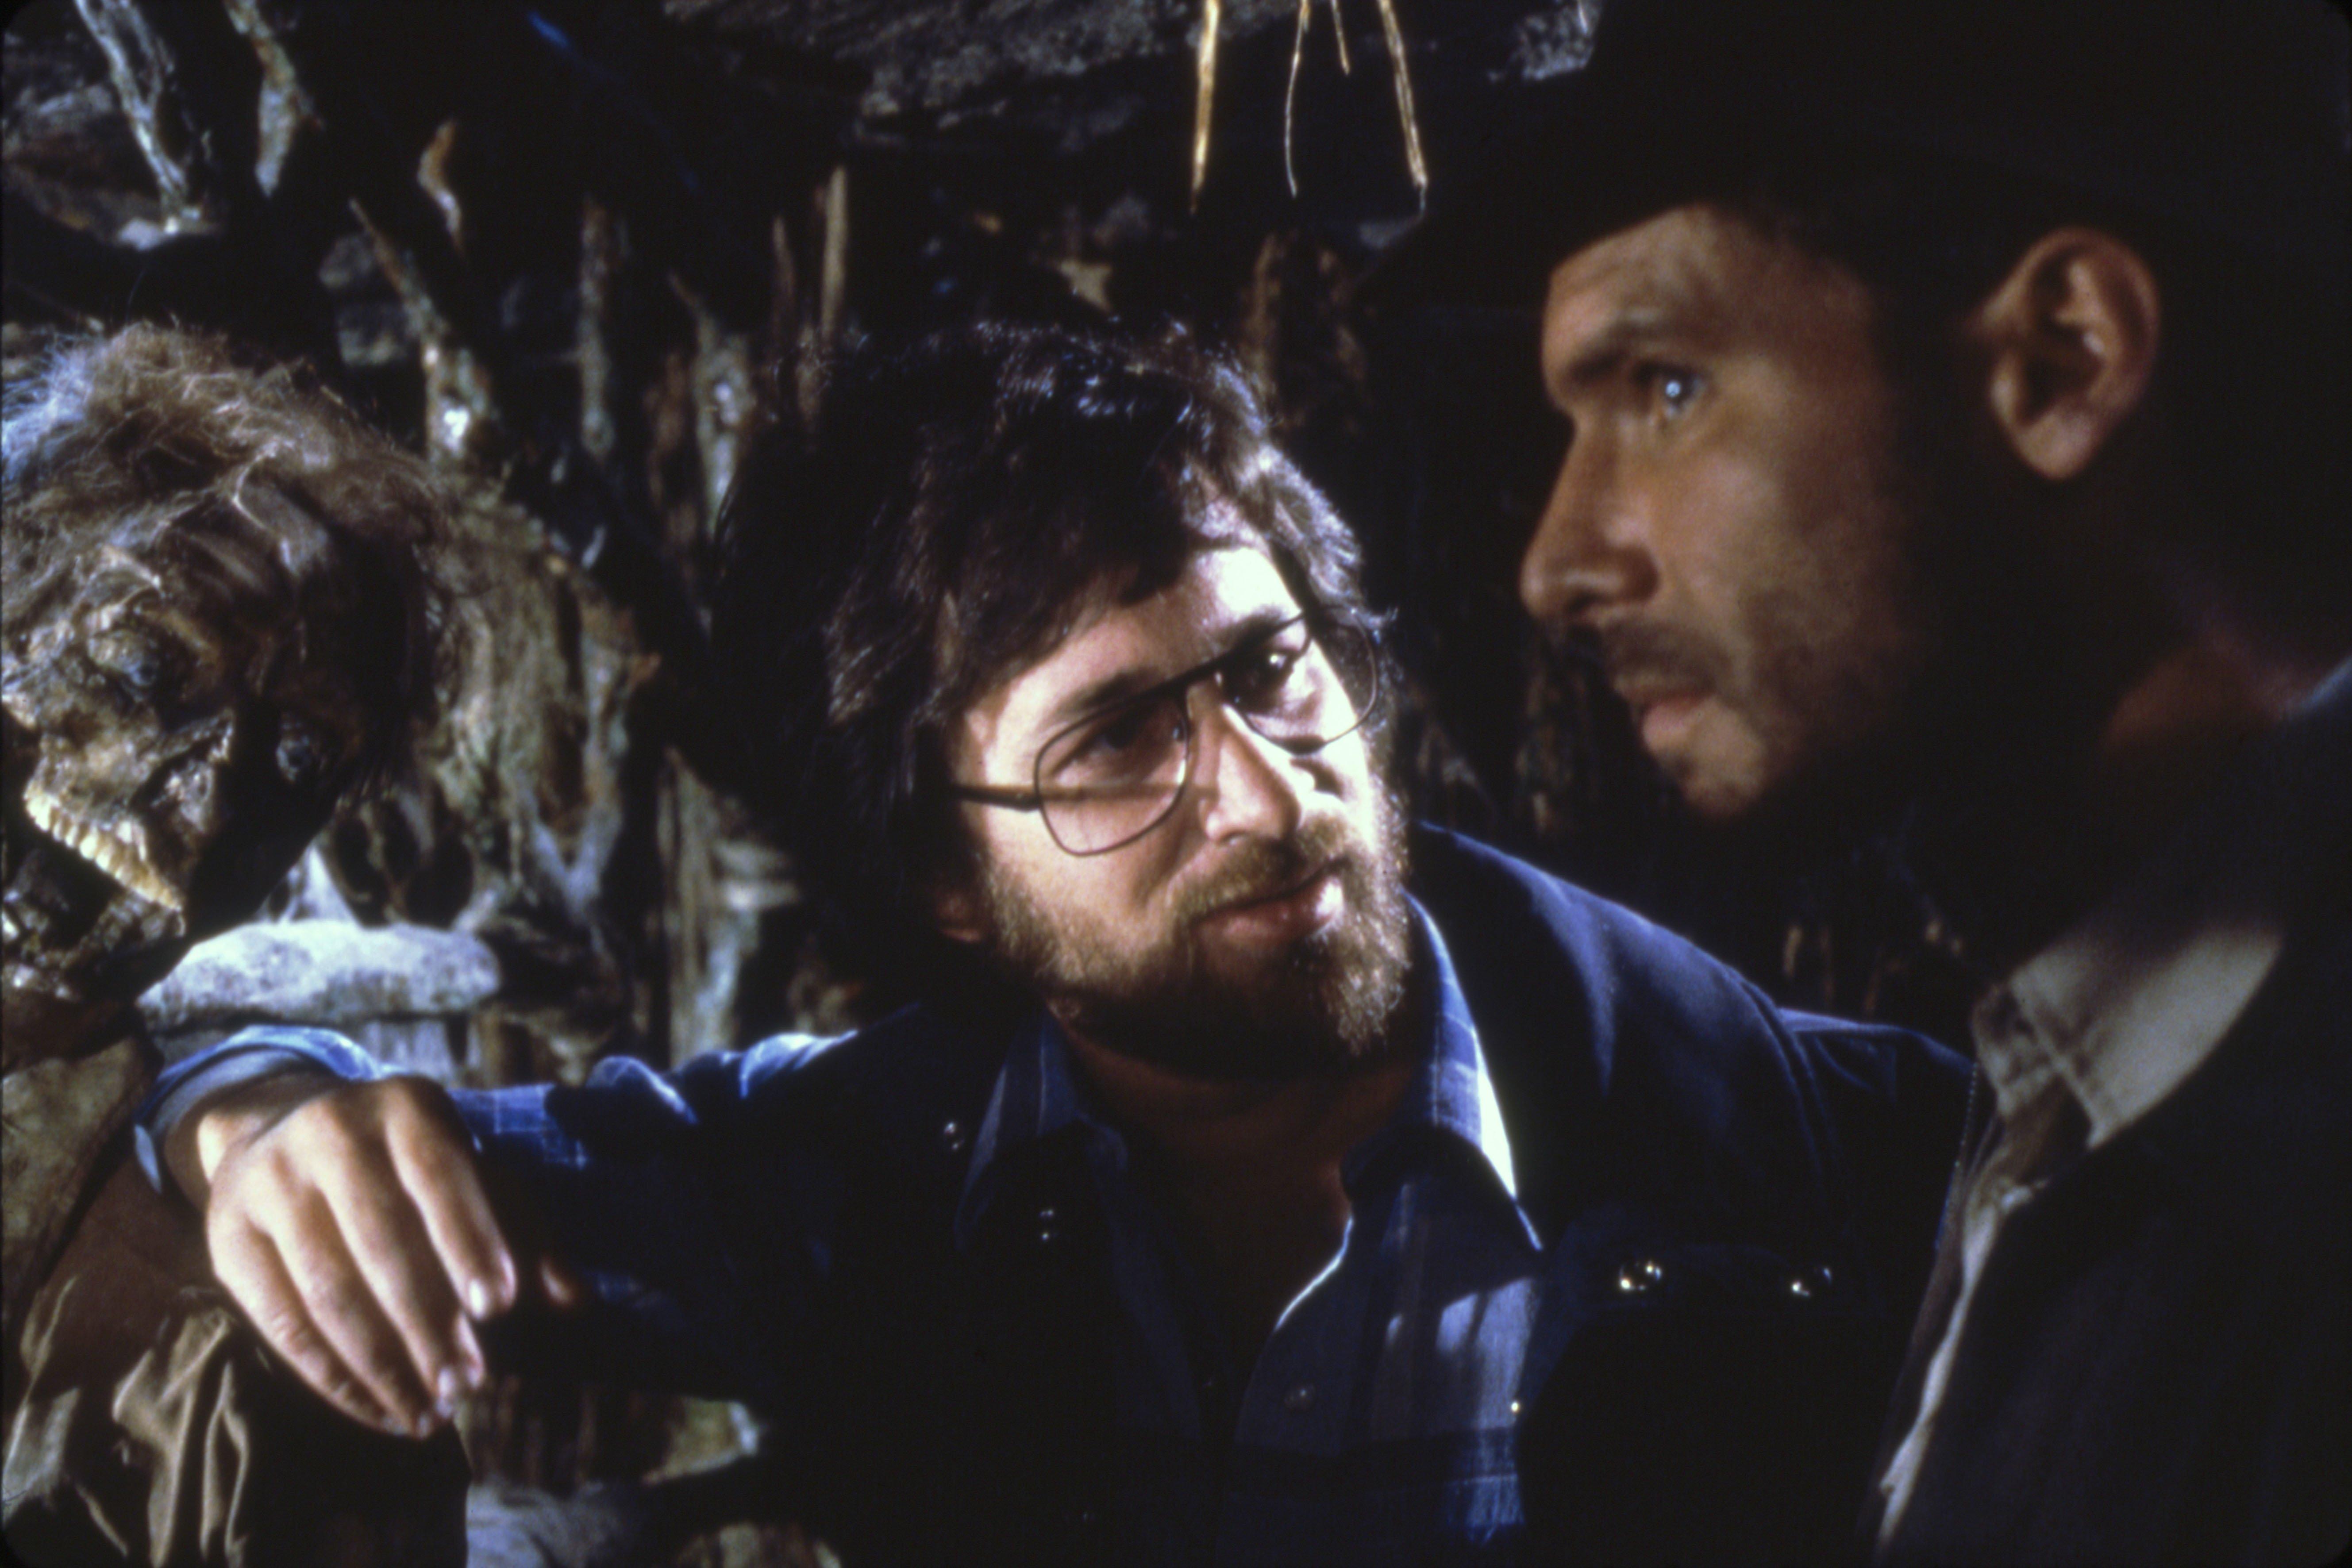 Steven-Spielberg-Harrison-Ford-Raiders-of-the-Lost-Ark-Photo-Credit-Sunset-Boulevard-Corbis-via-Getty-Images.jpg